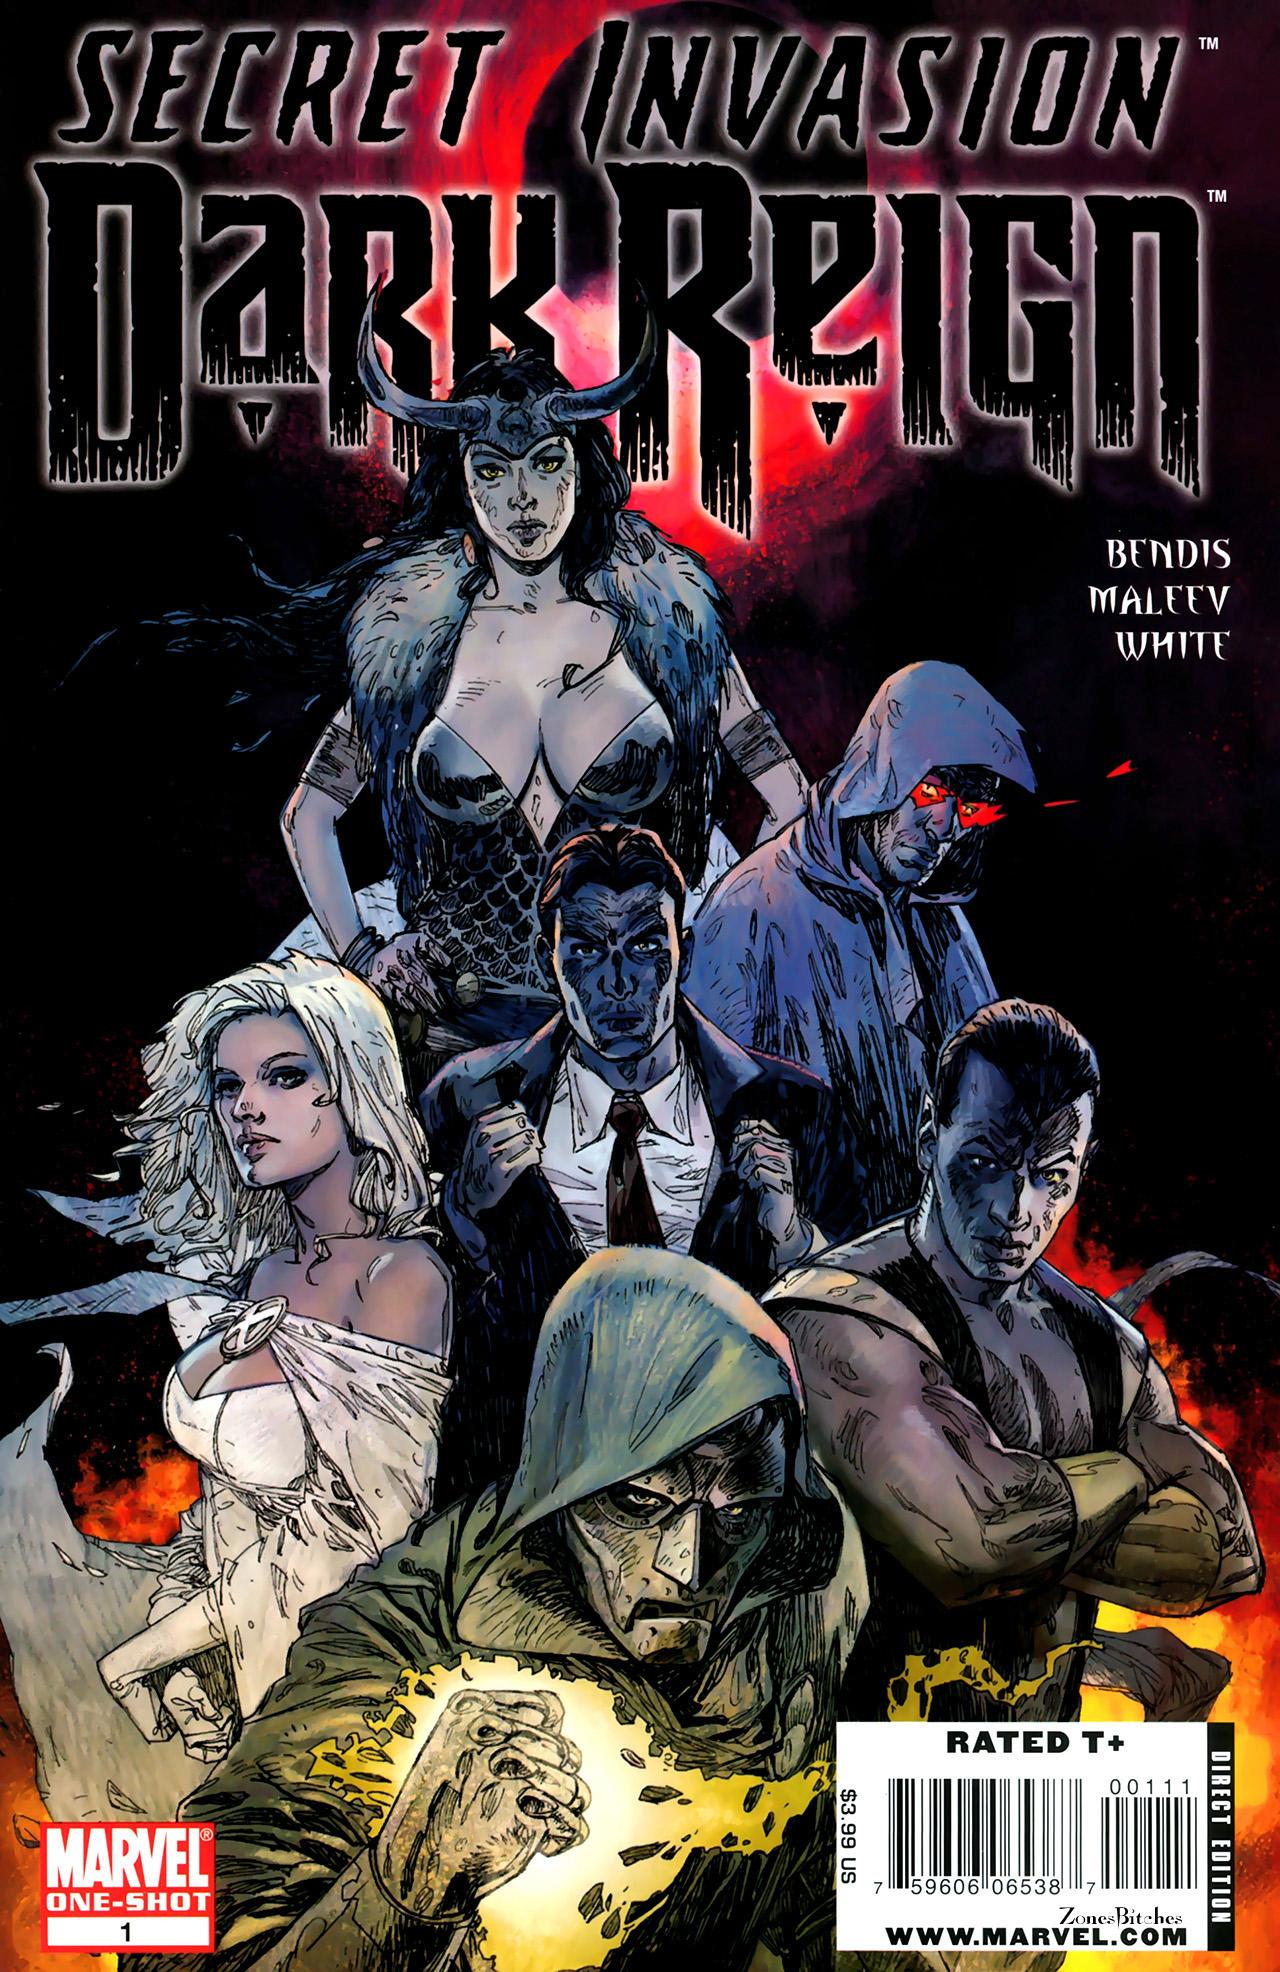 Read online Secret Invasion: Dark Reign comic -  Issue # Full - 1